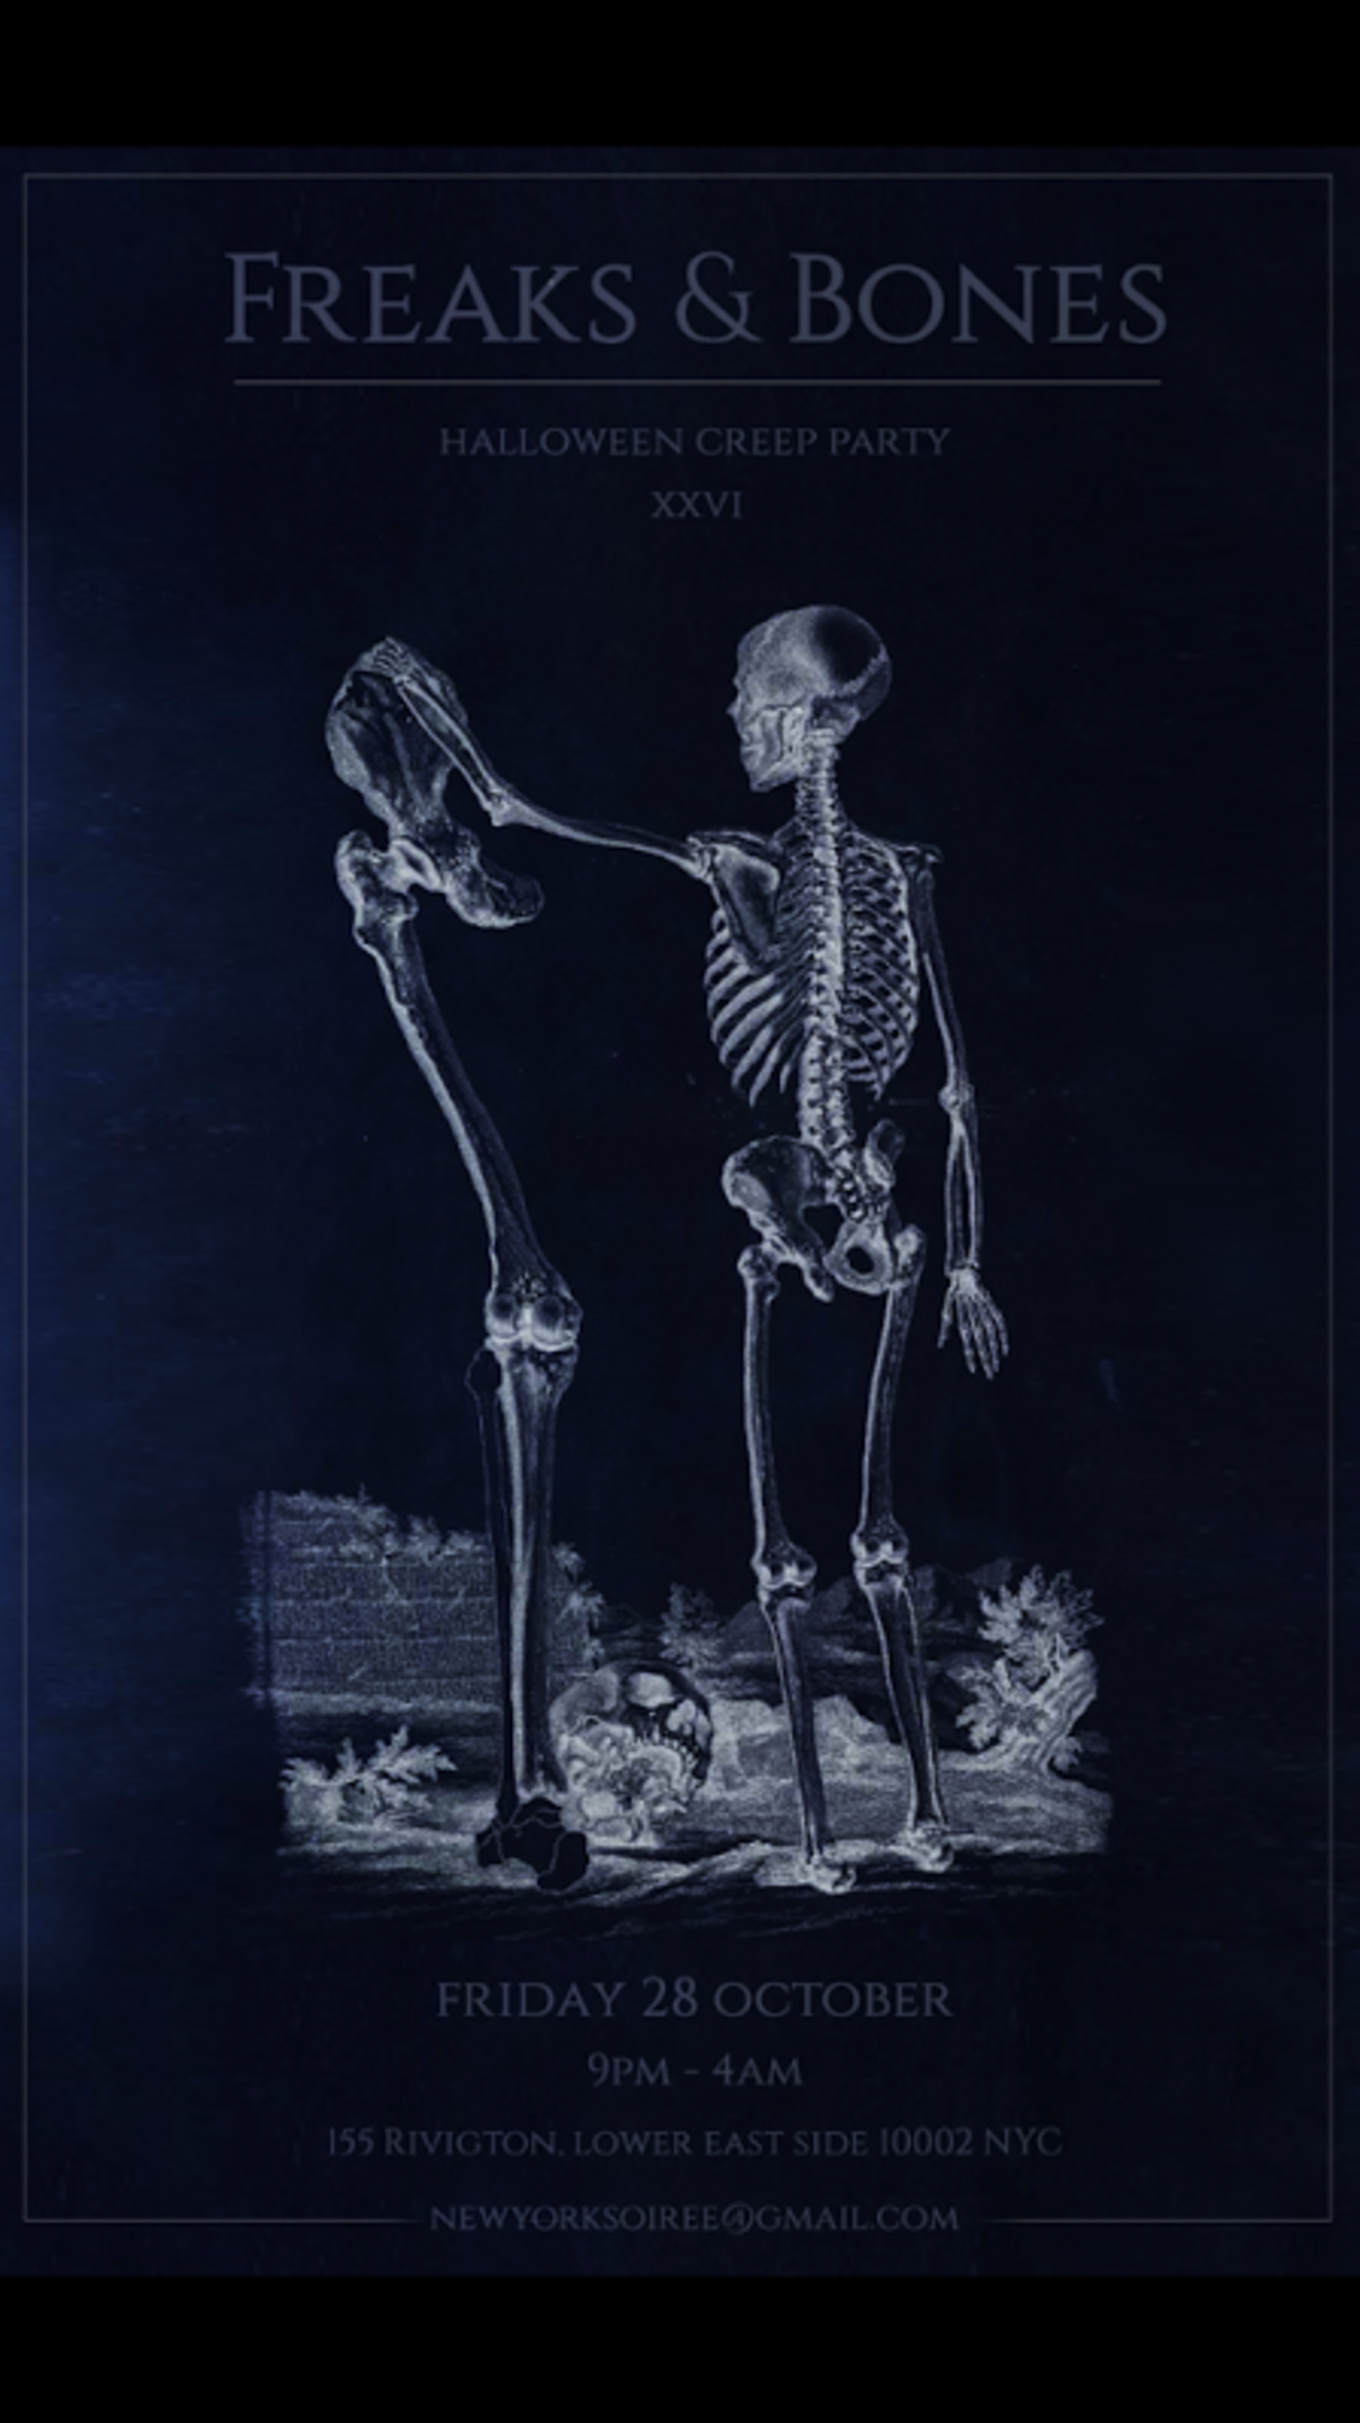 Halloween Creepy Party at Freak & Bones - Freak & Bones, New York ...